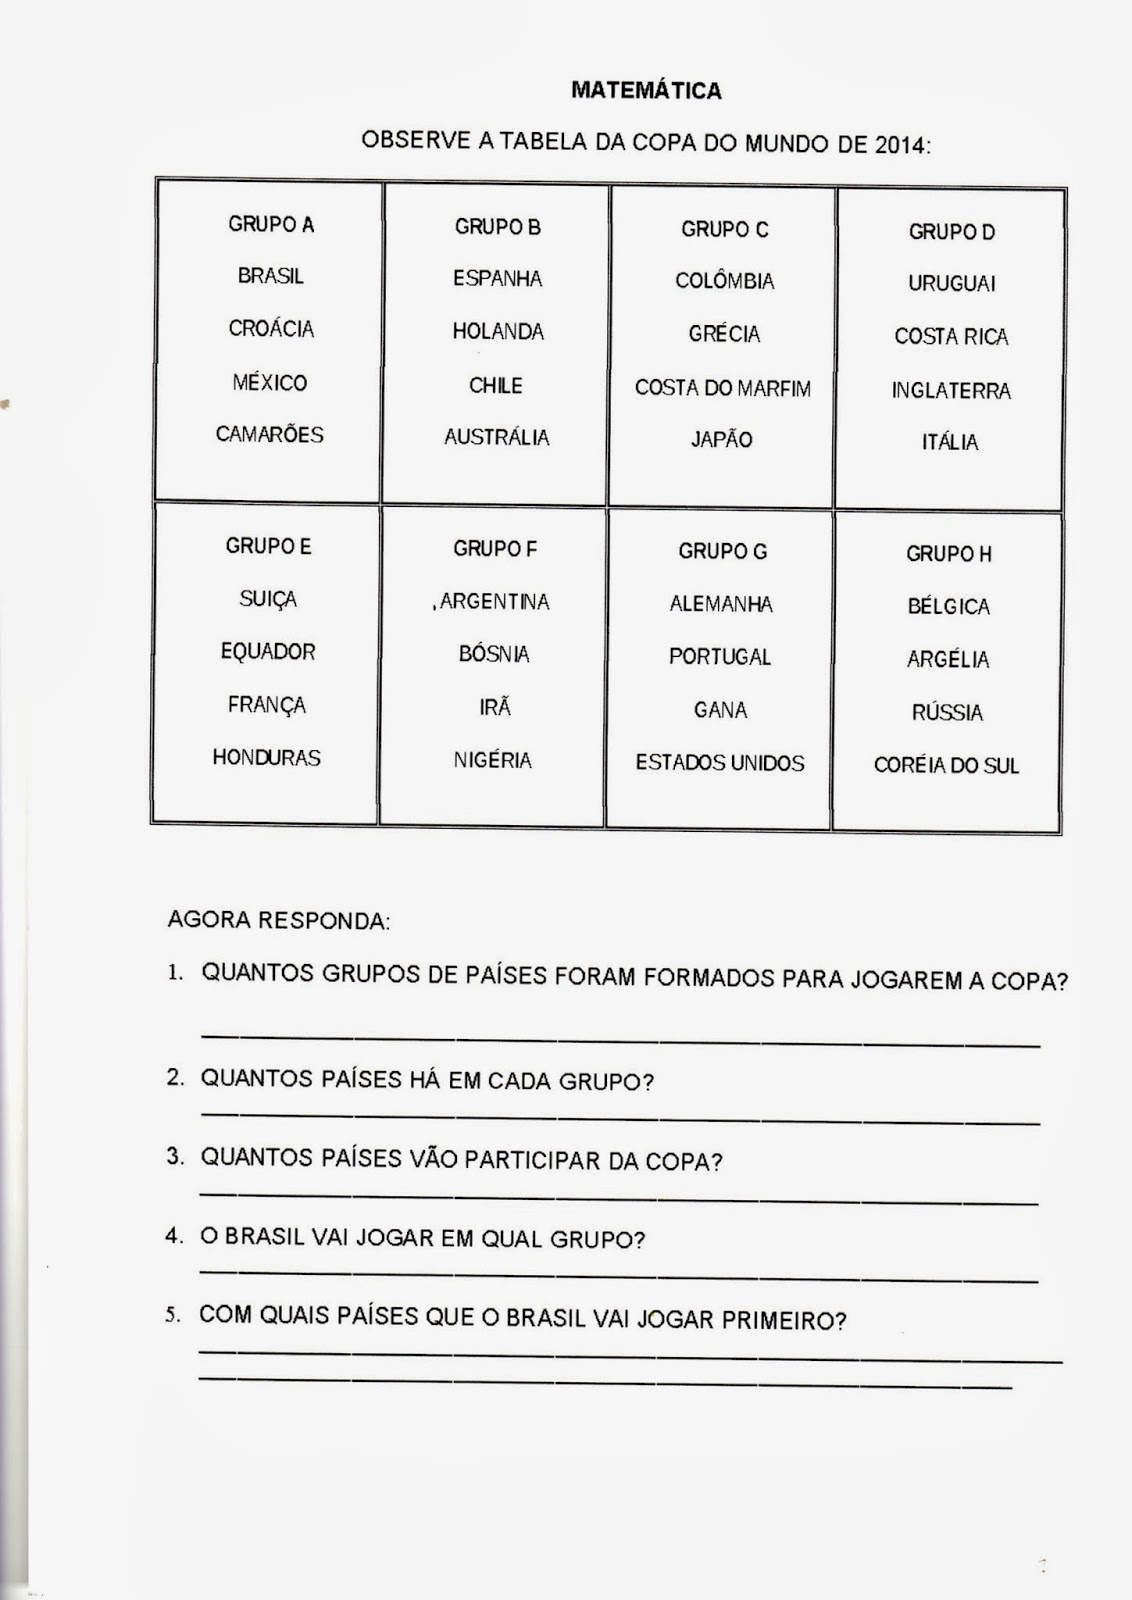 Nayara especial copa do mundo 2018 - 2 2